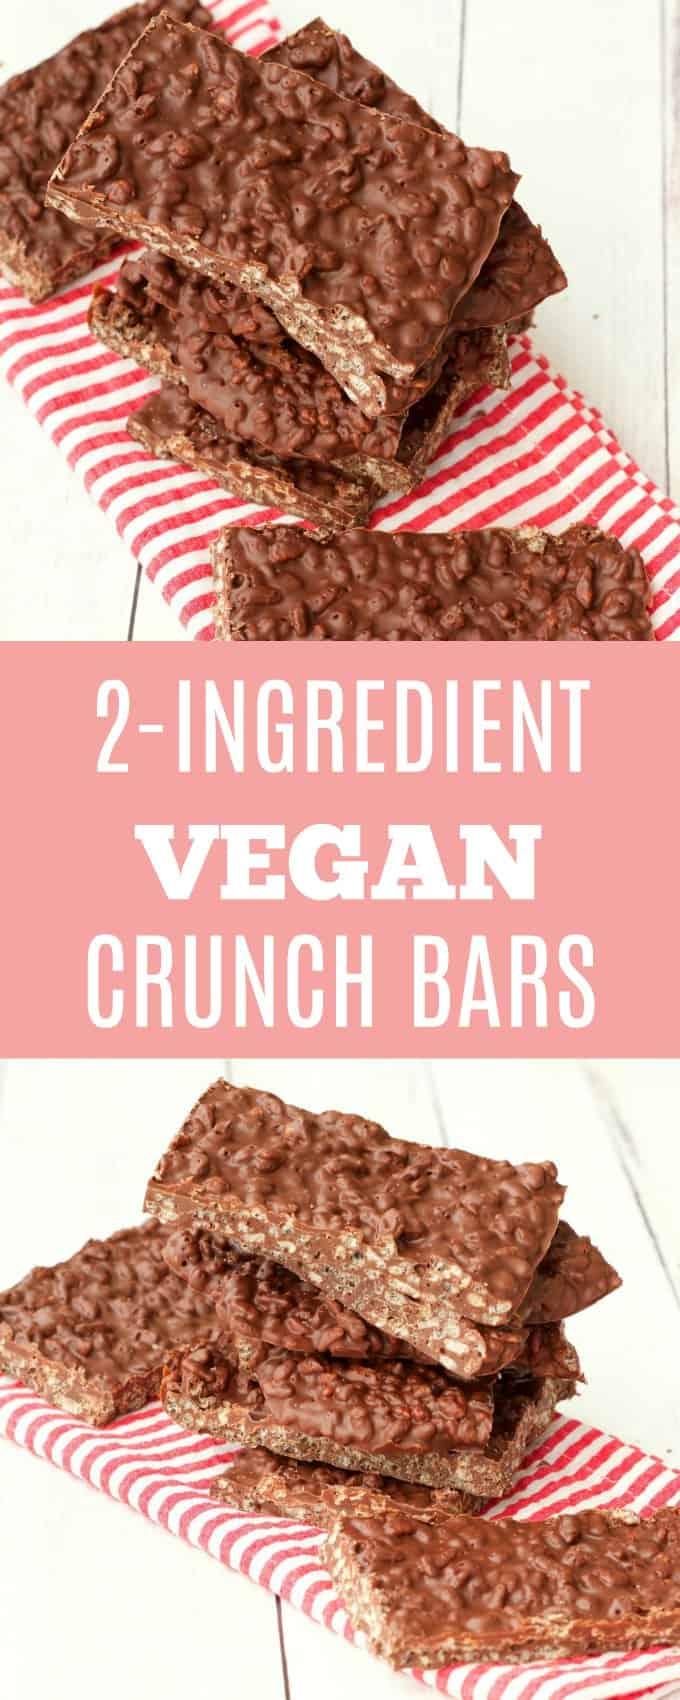 Simple vegan chocolate crunch bars. Just 2-ingredients and 15 minutes and you have the most delicious treat. Vegan and Gluten-Free. Vegan | Vegan Chocolate | Vegan Desserts | lovingitvegan.com